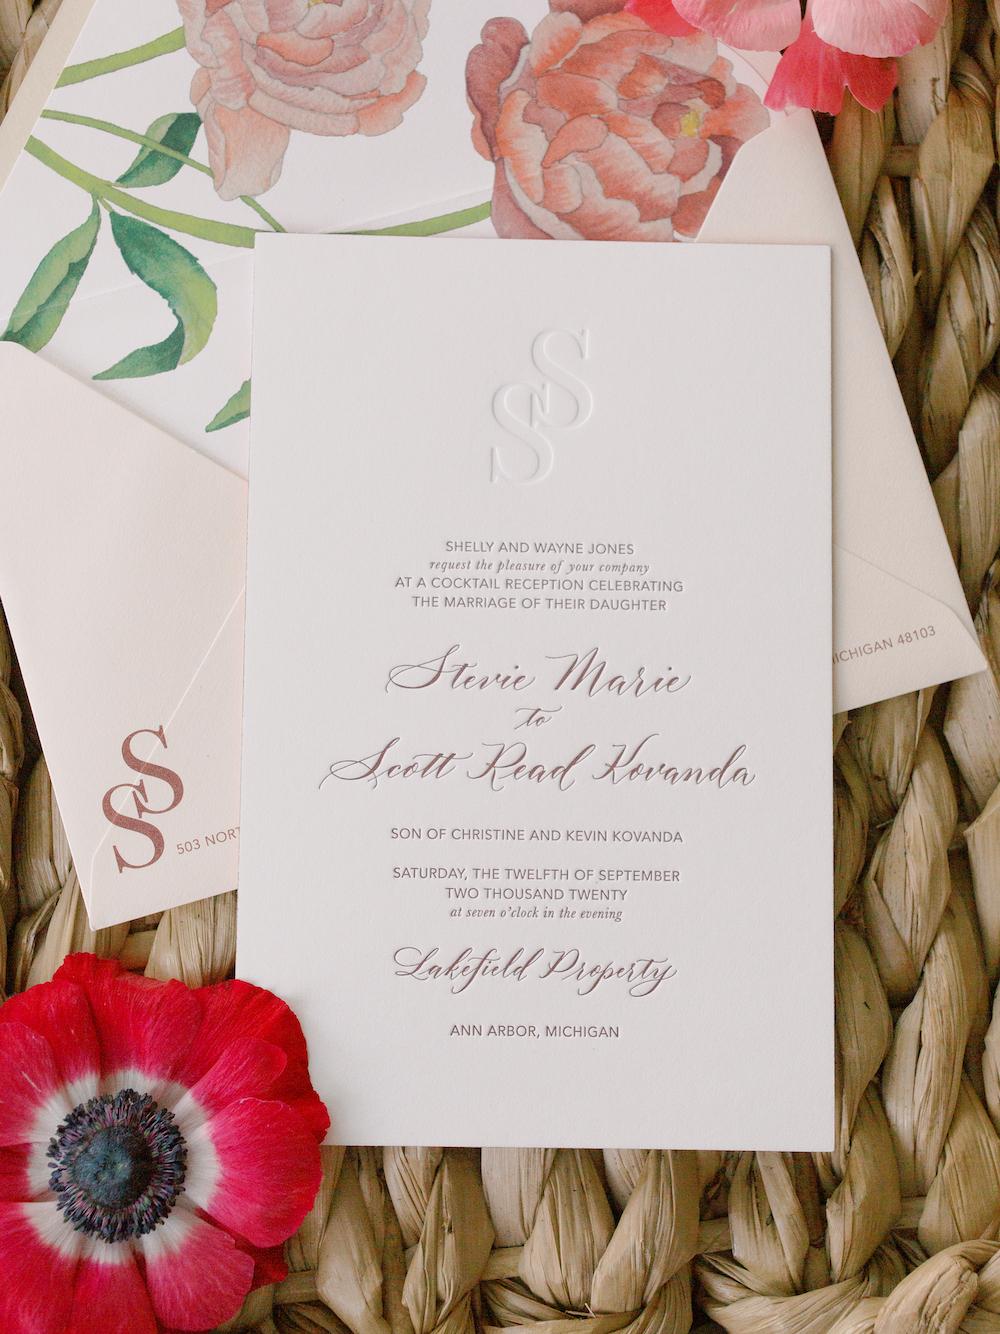 Classic wedding invitation - Intimate wedding at home in Ann Arbor, Michigan - Leah E. Moss Designs - Photo by Blaine Siesser